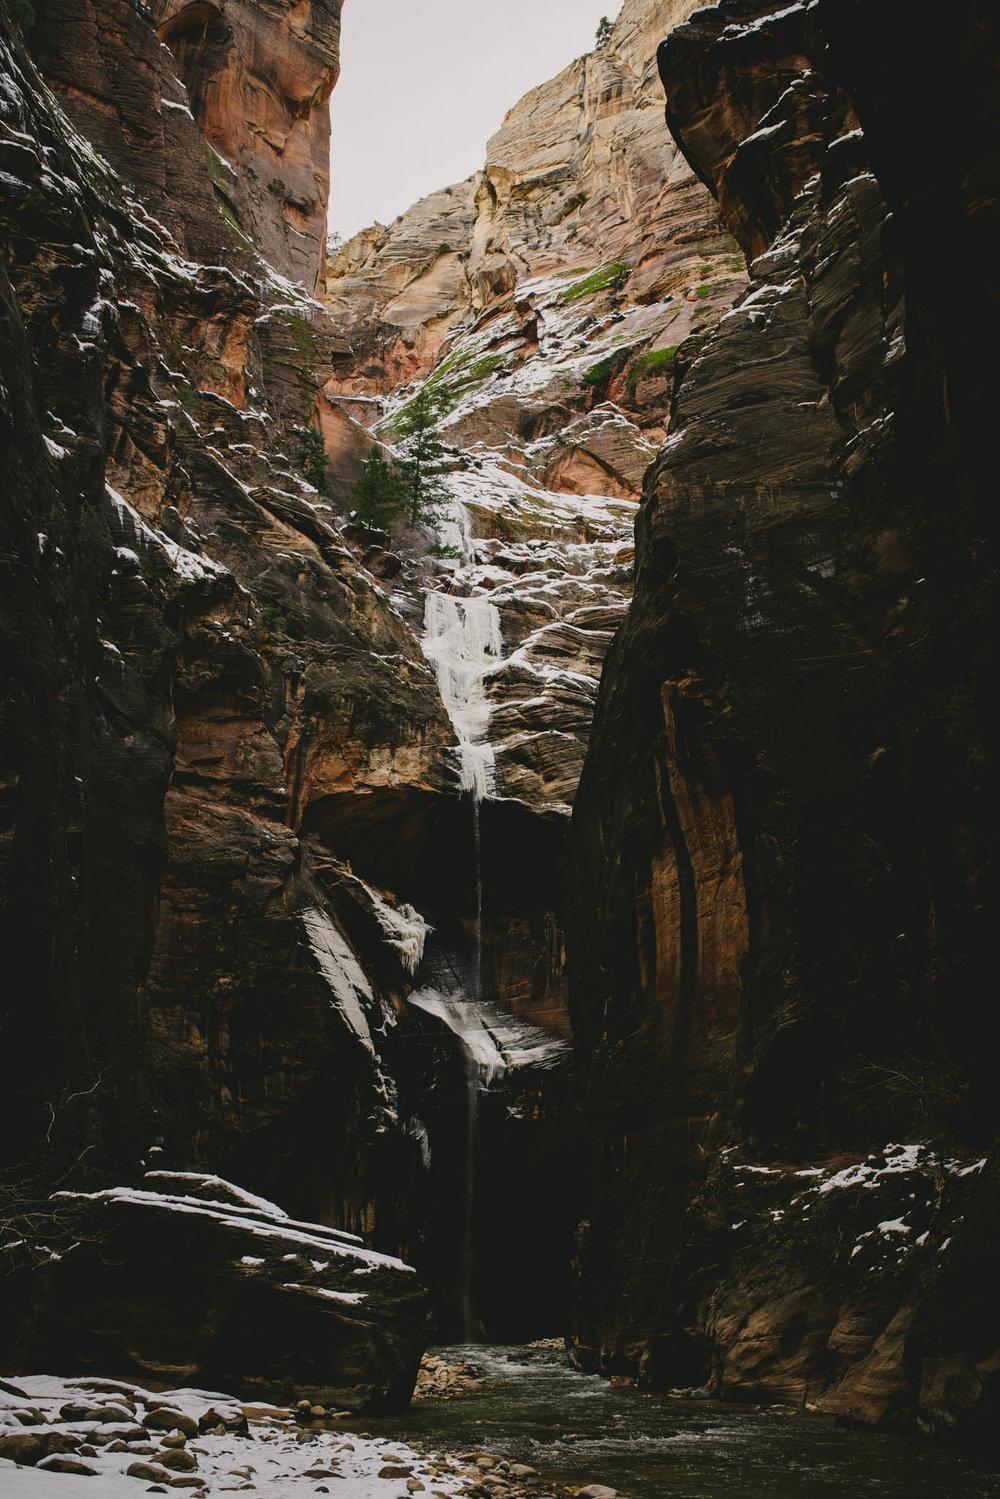 zion-national-park-photo.jpg